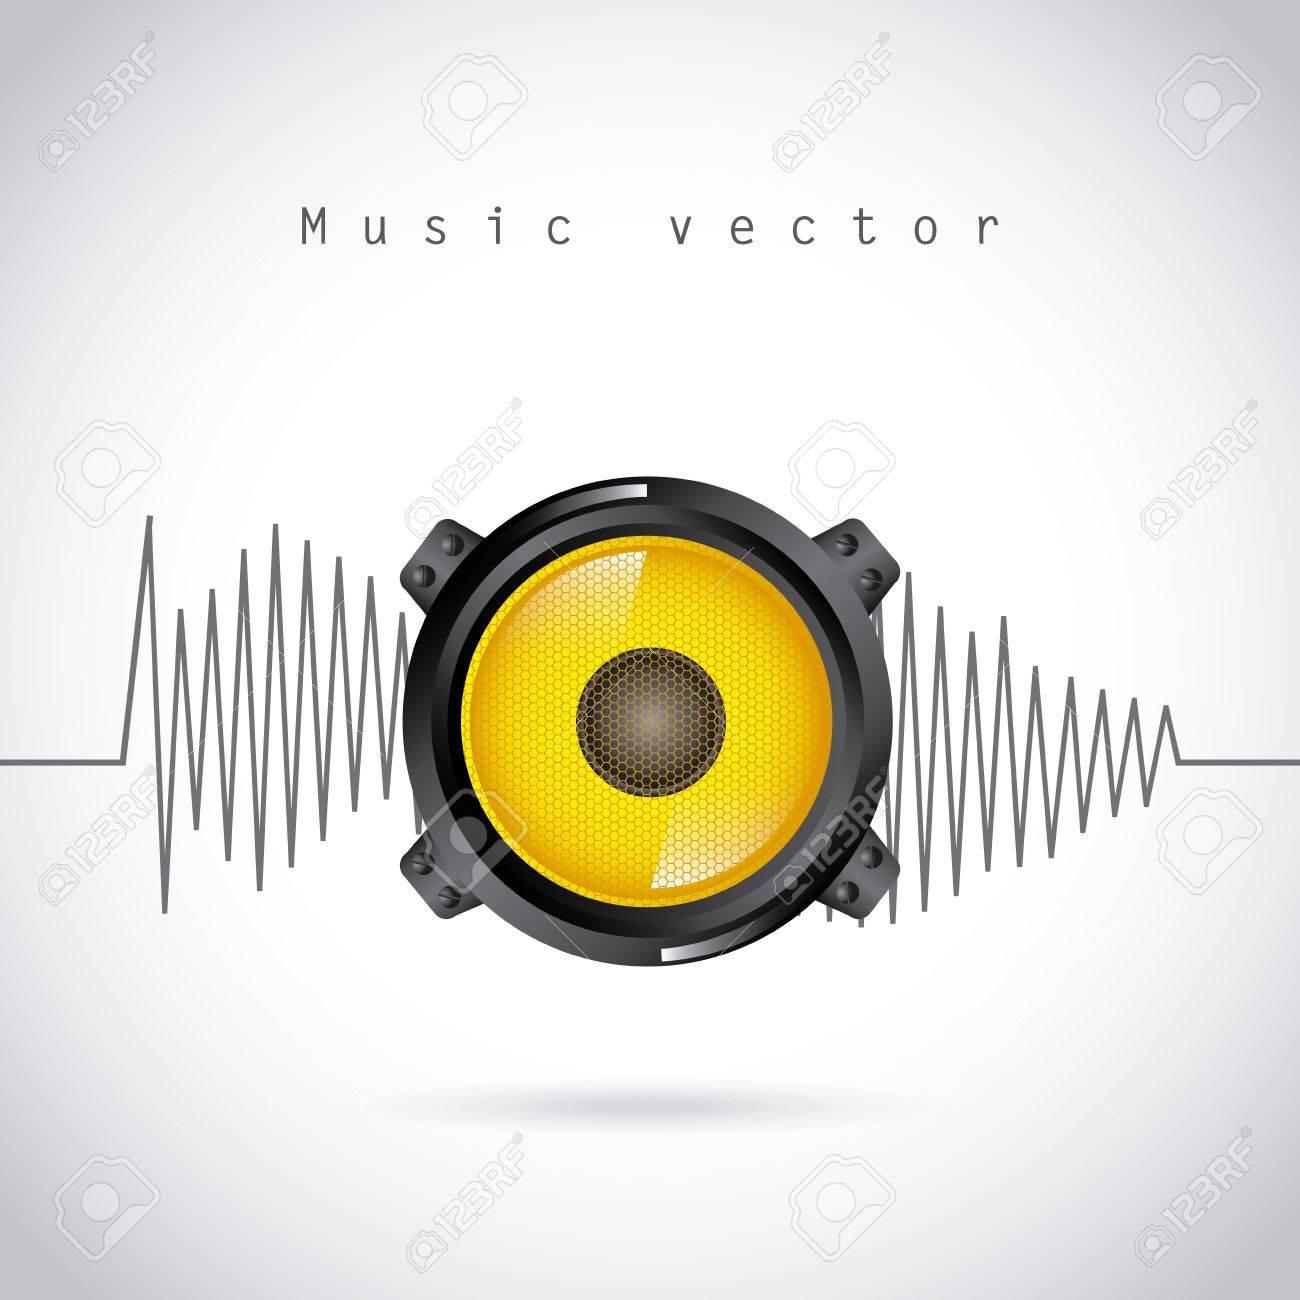 sound wave design over gray background vector illustration Stock Vector - 20107917